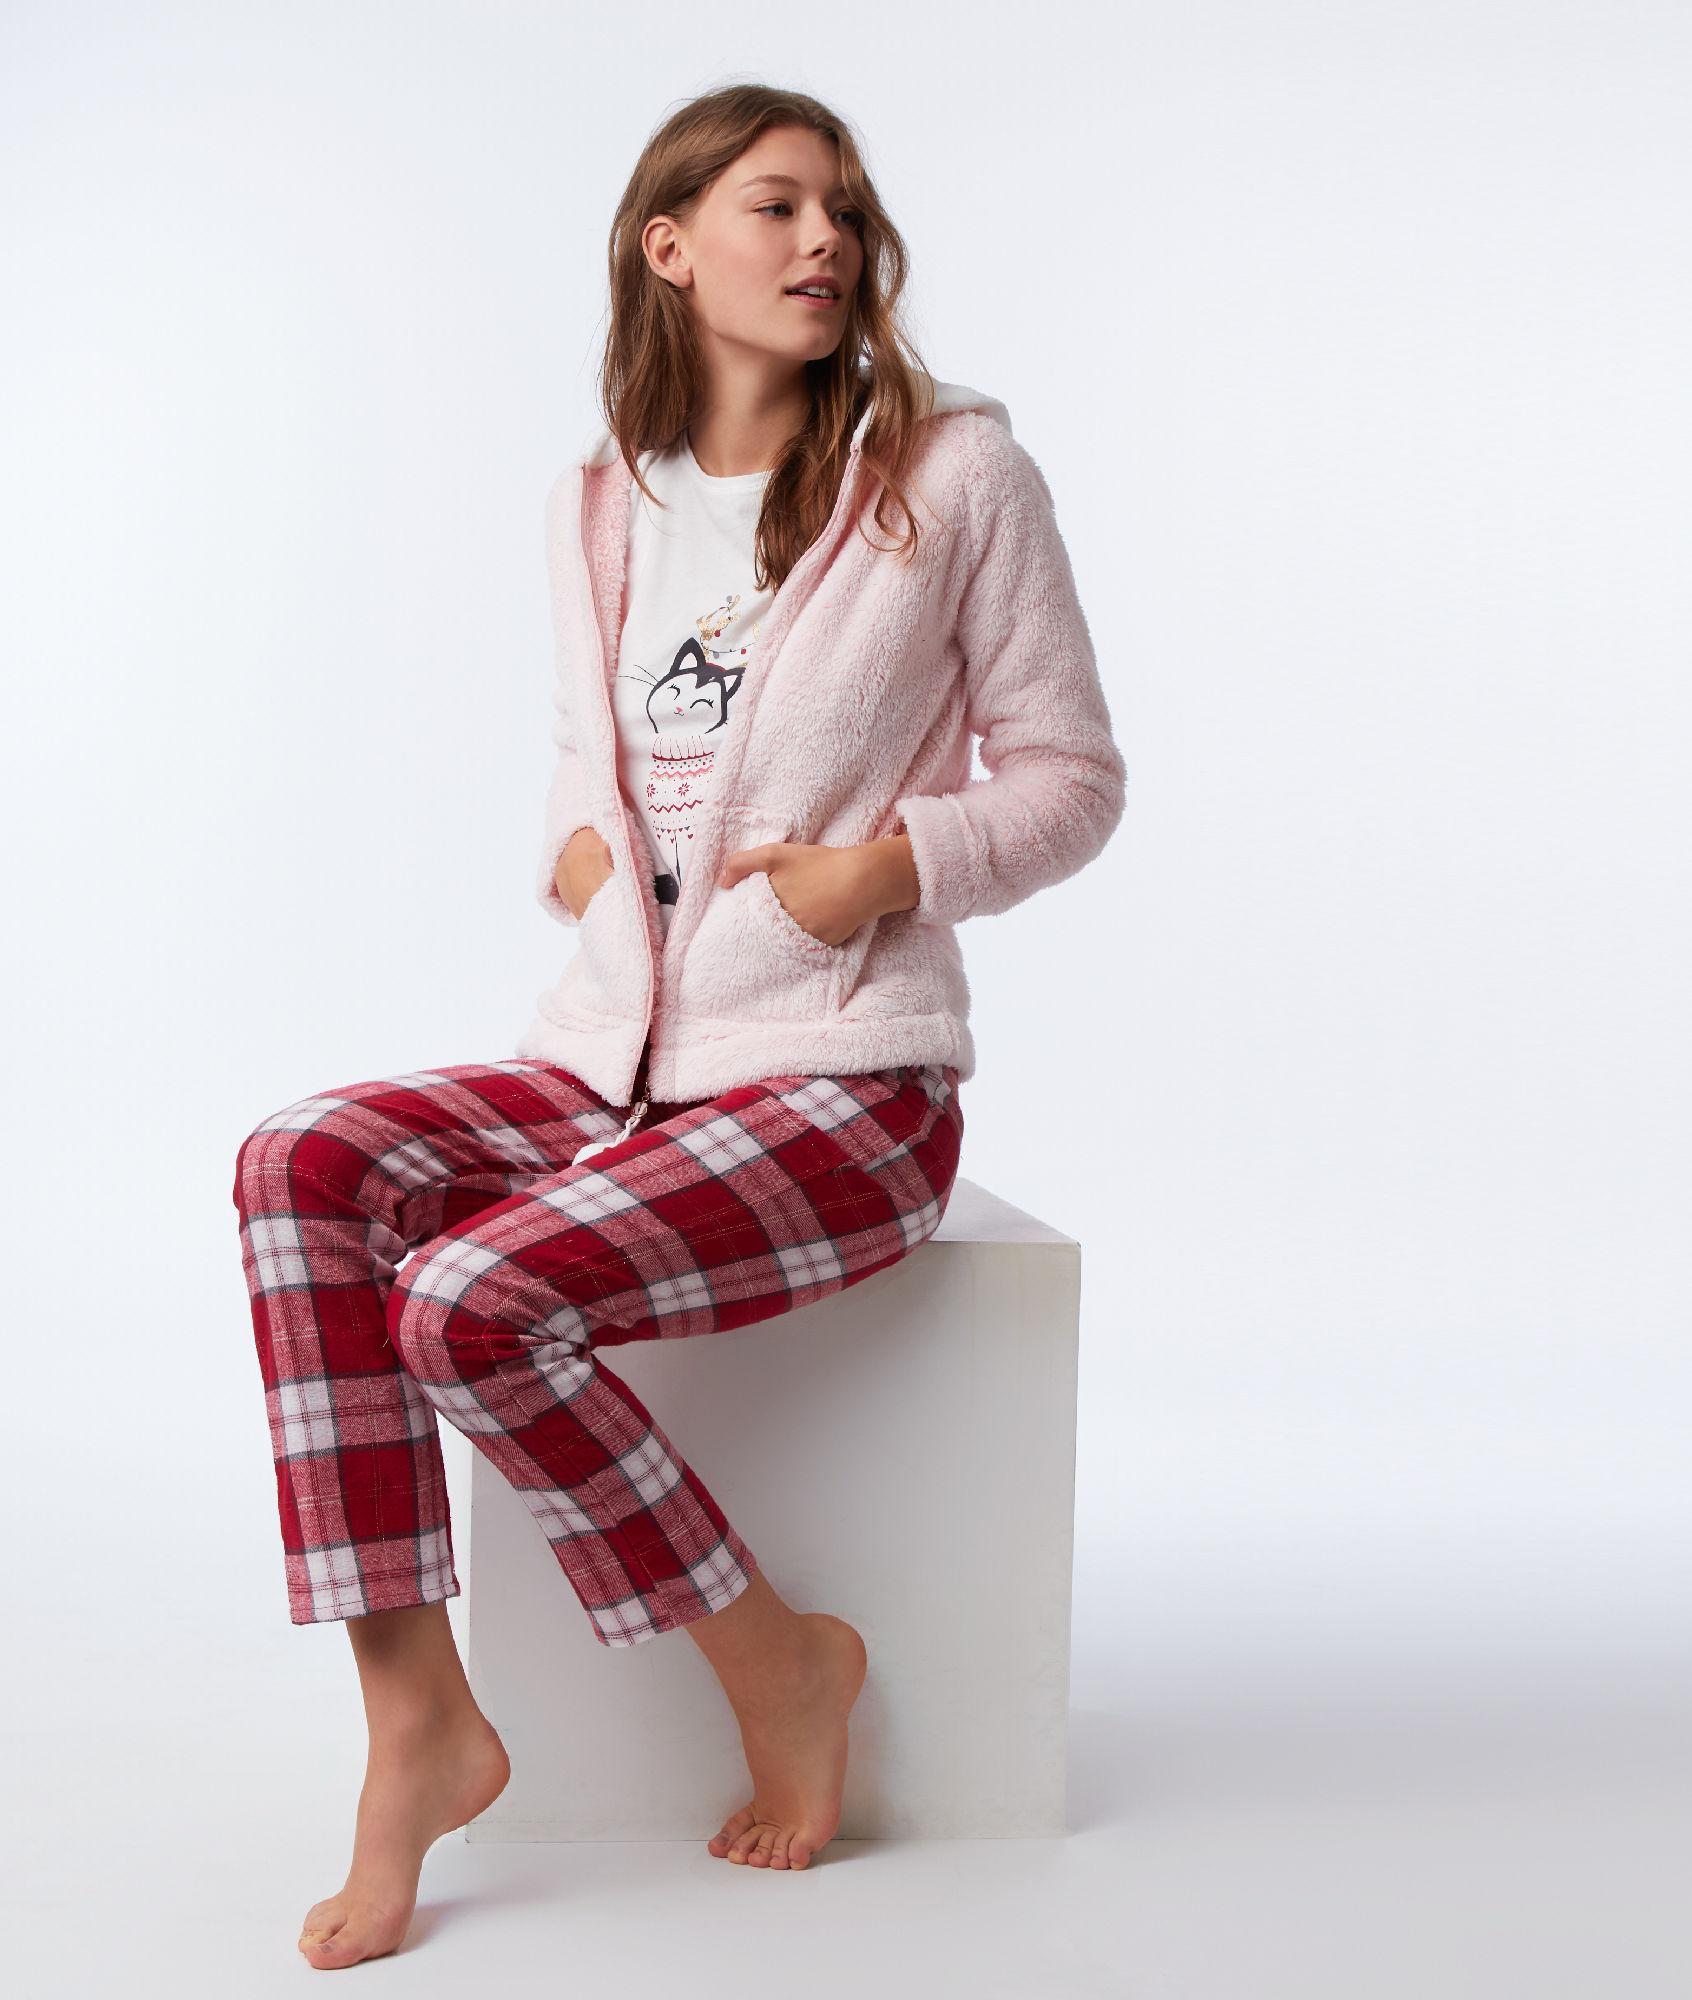 Soldes pyjama etam